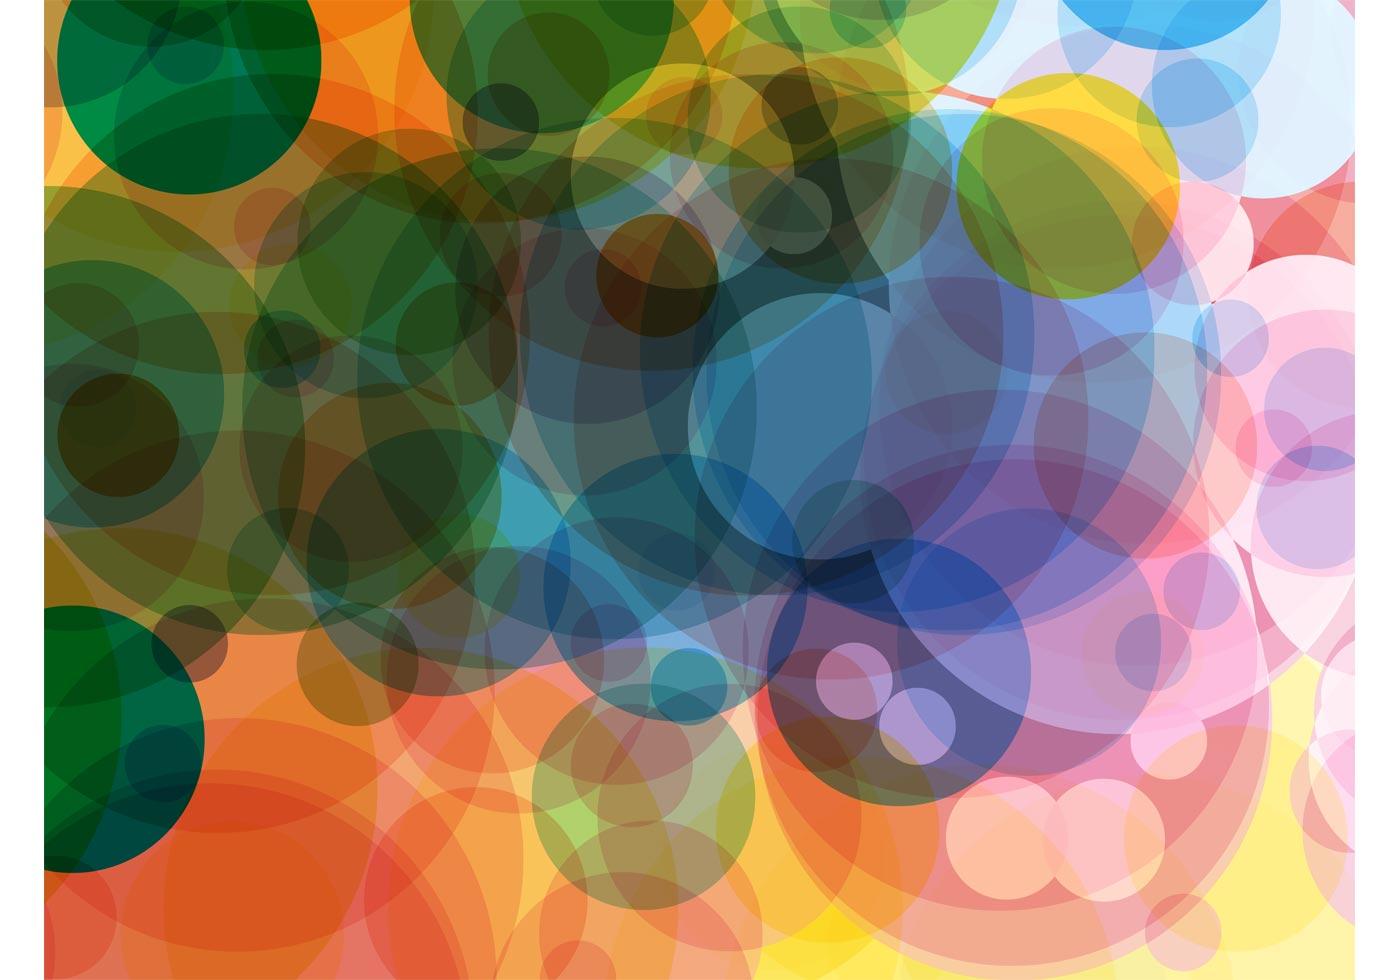 Abstract Circles Vector Download Free Vector Art Stock